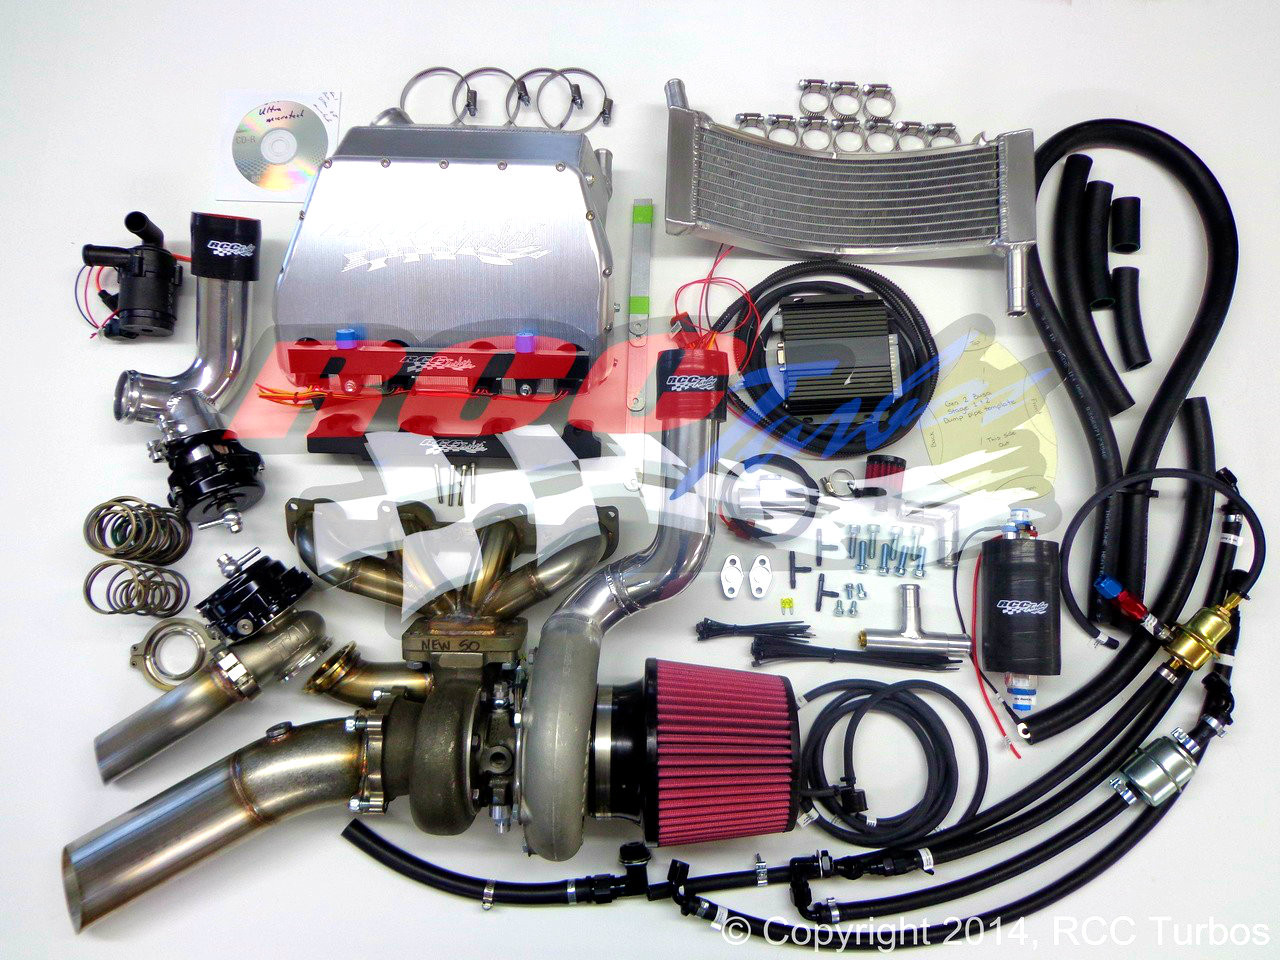 gsx1300r wiring diagram motor diagrams wiring diagram